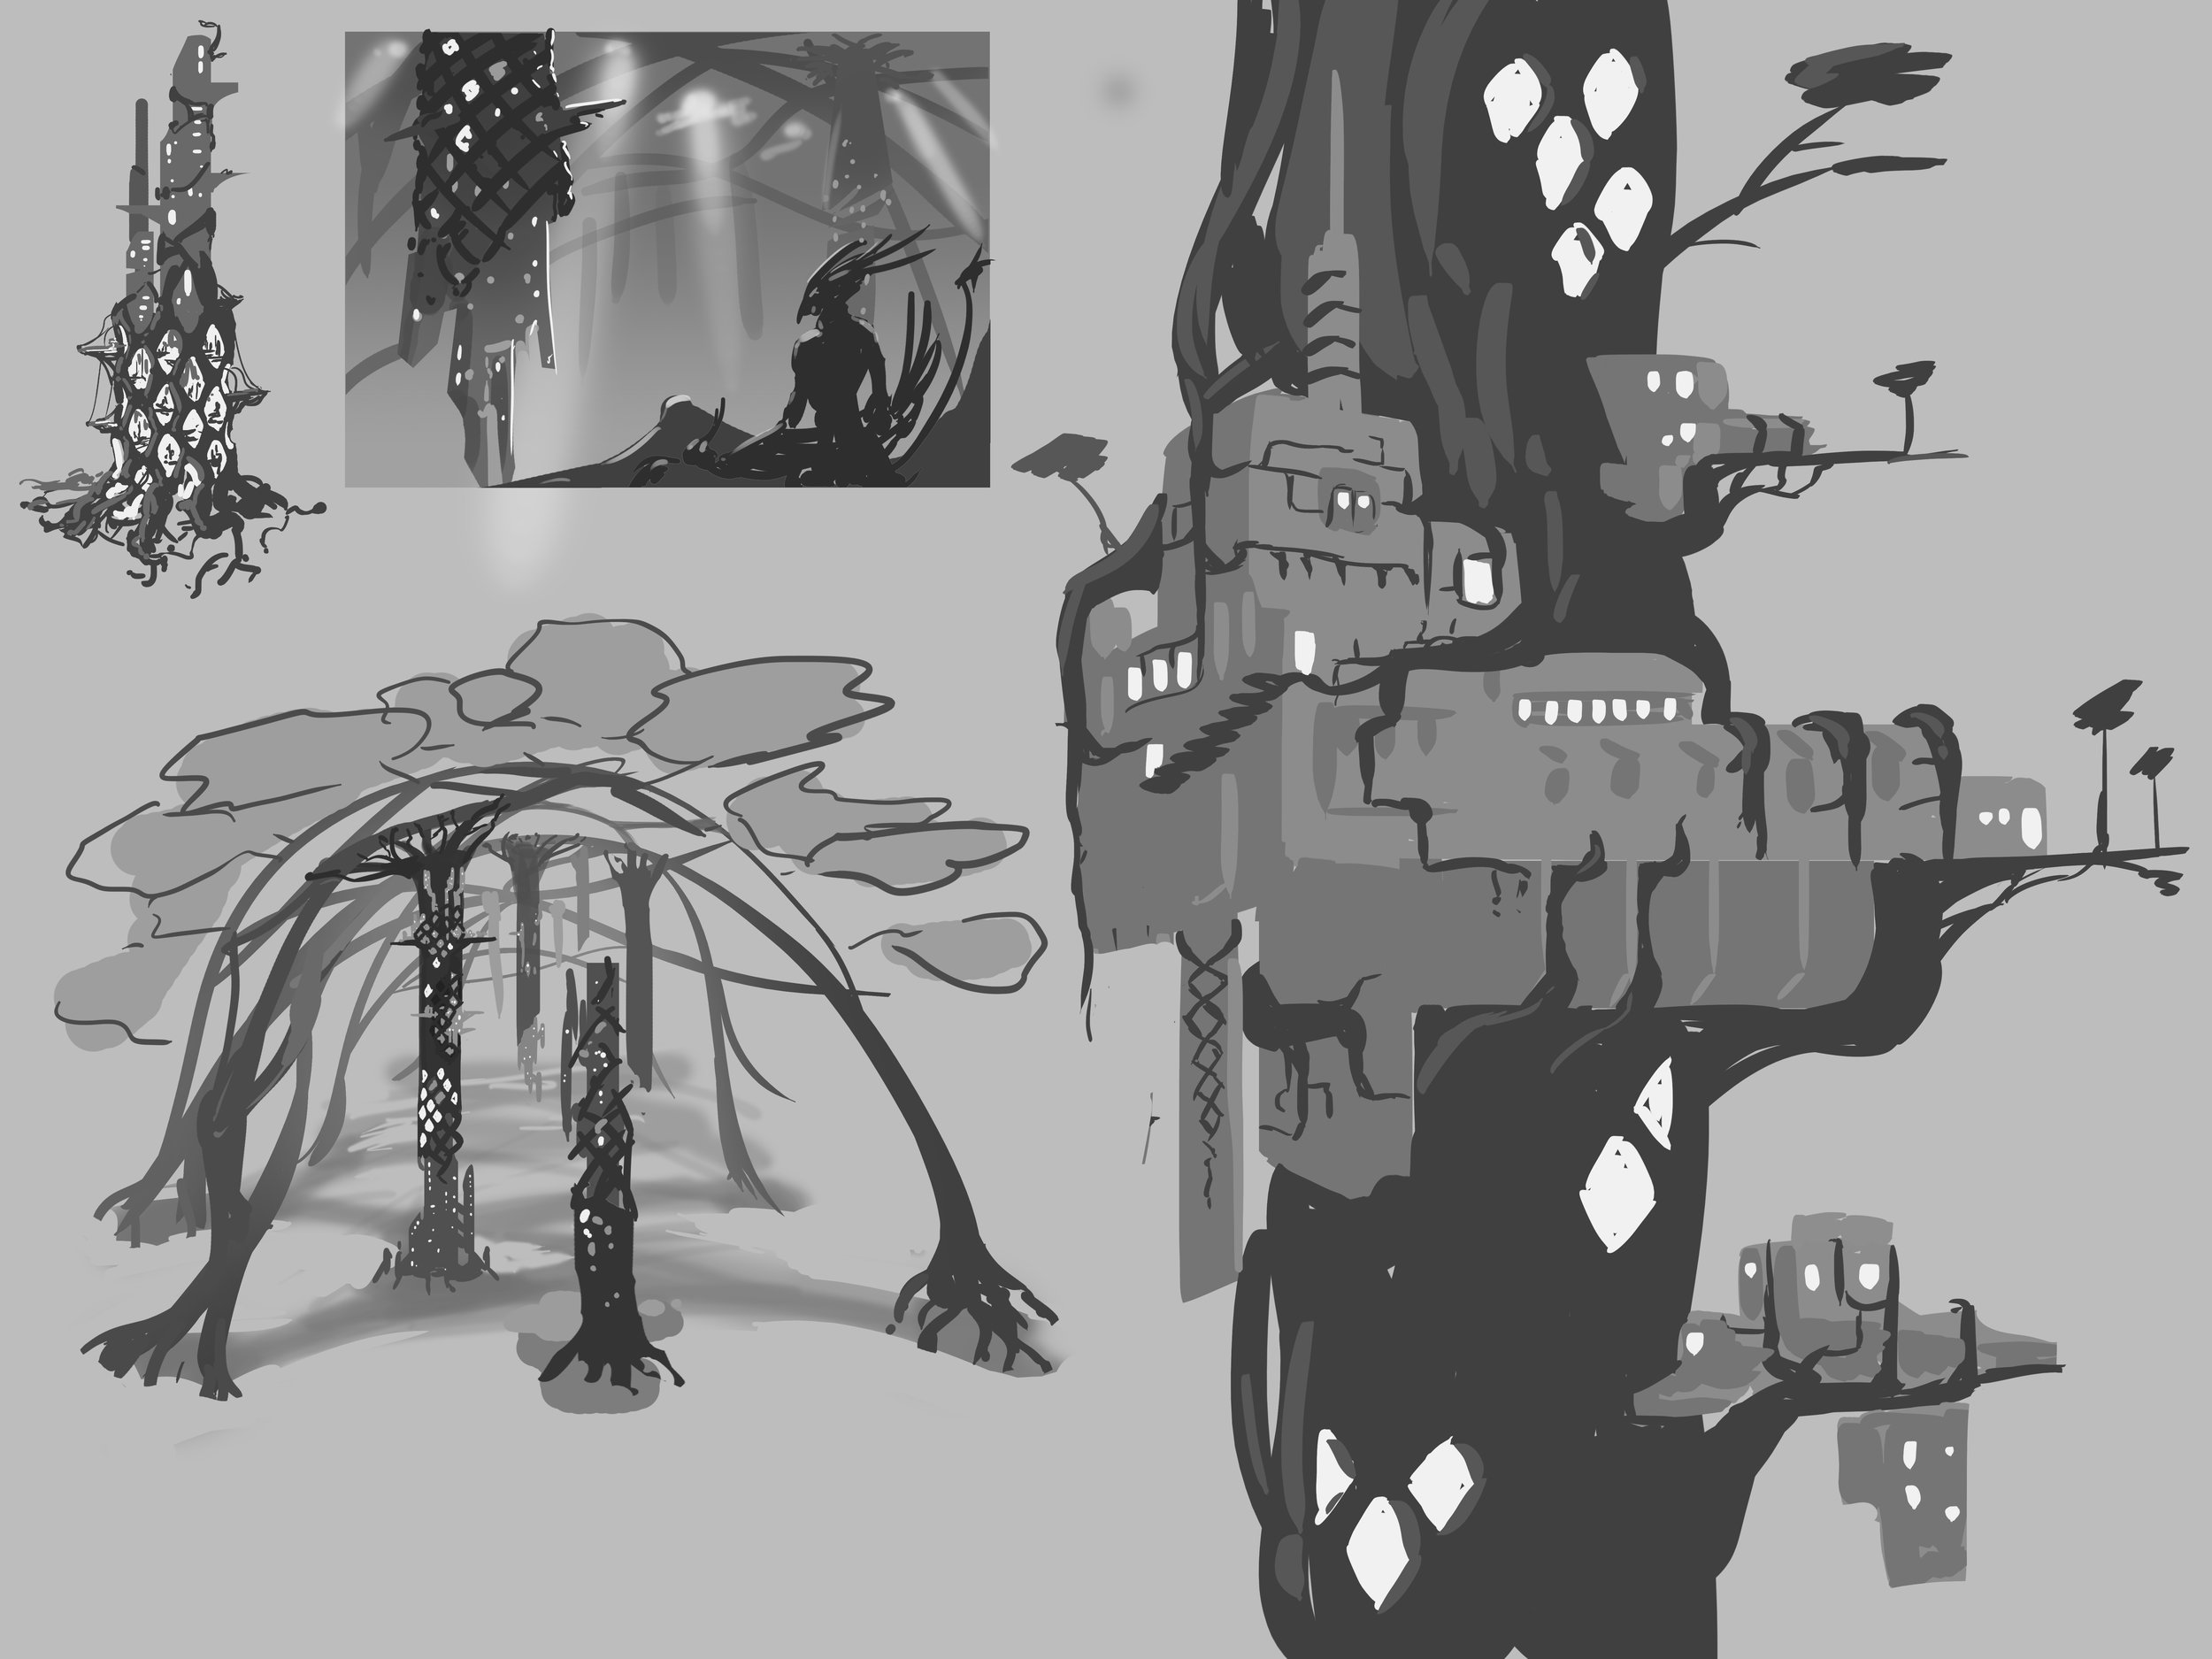 tree_cities_3.jpg